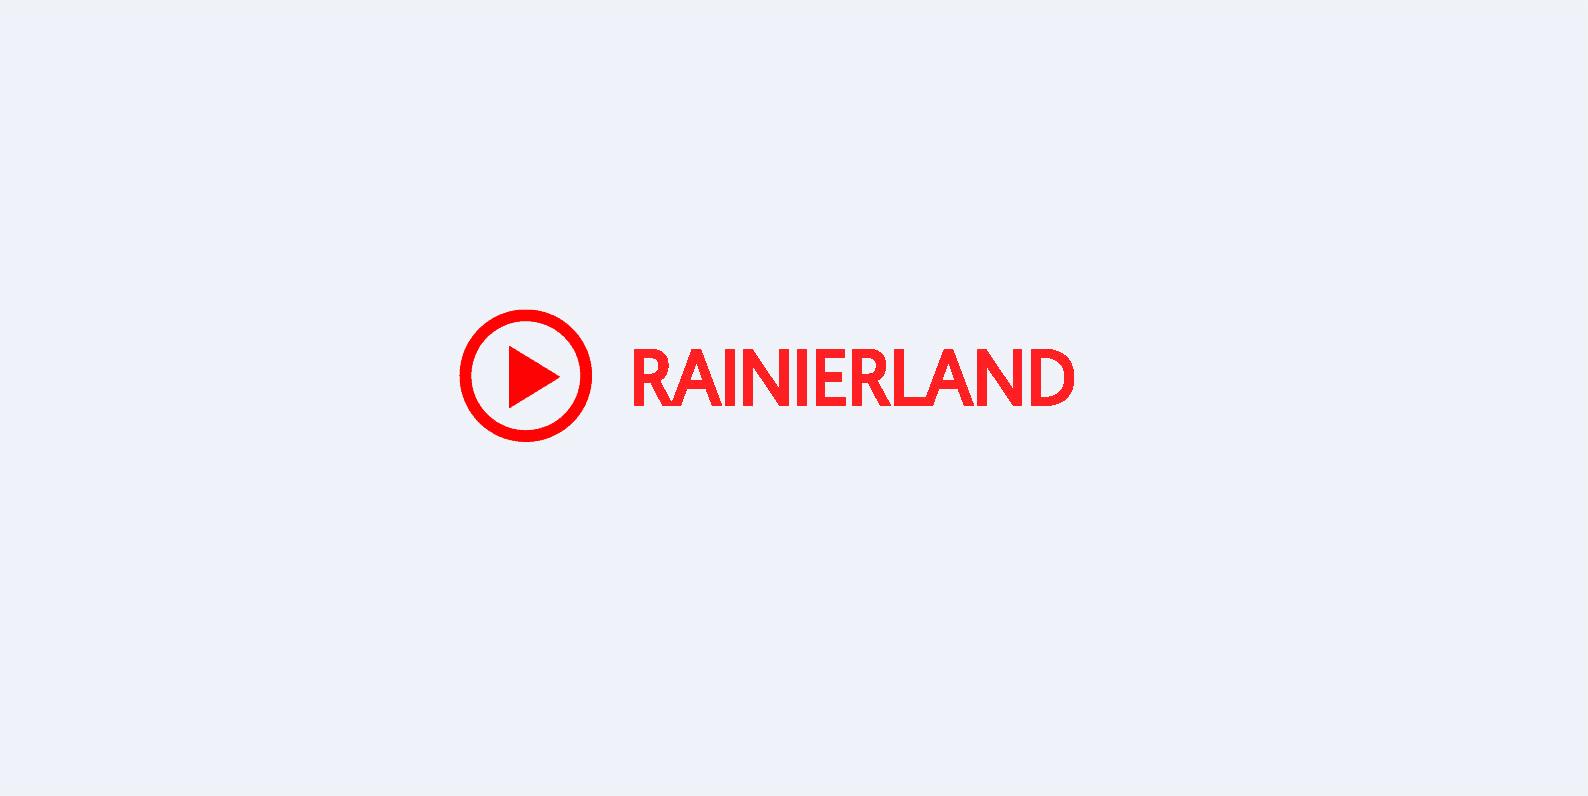 Alternatives to Rainierland